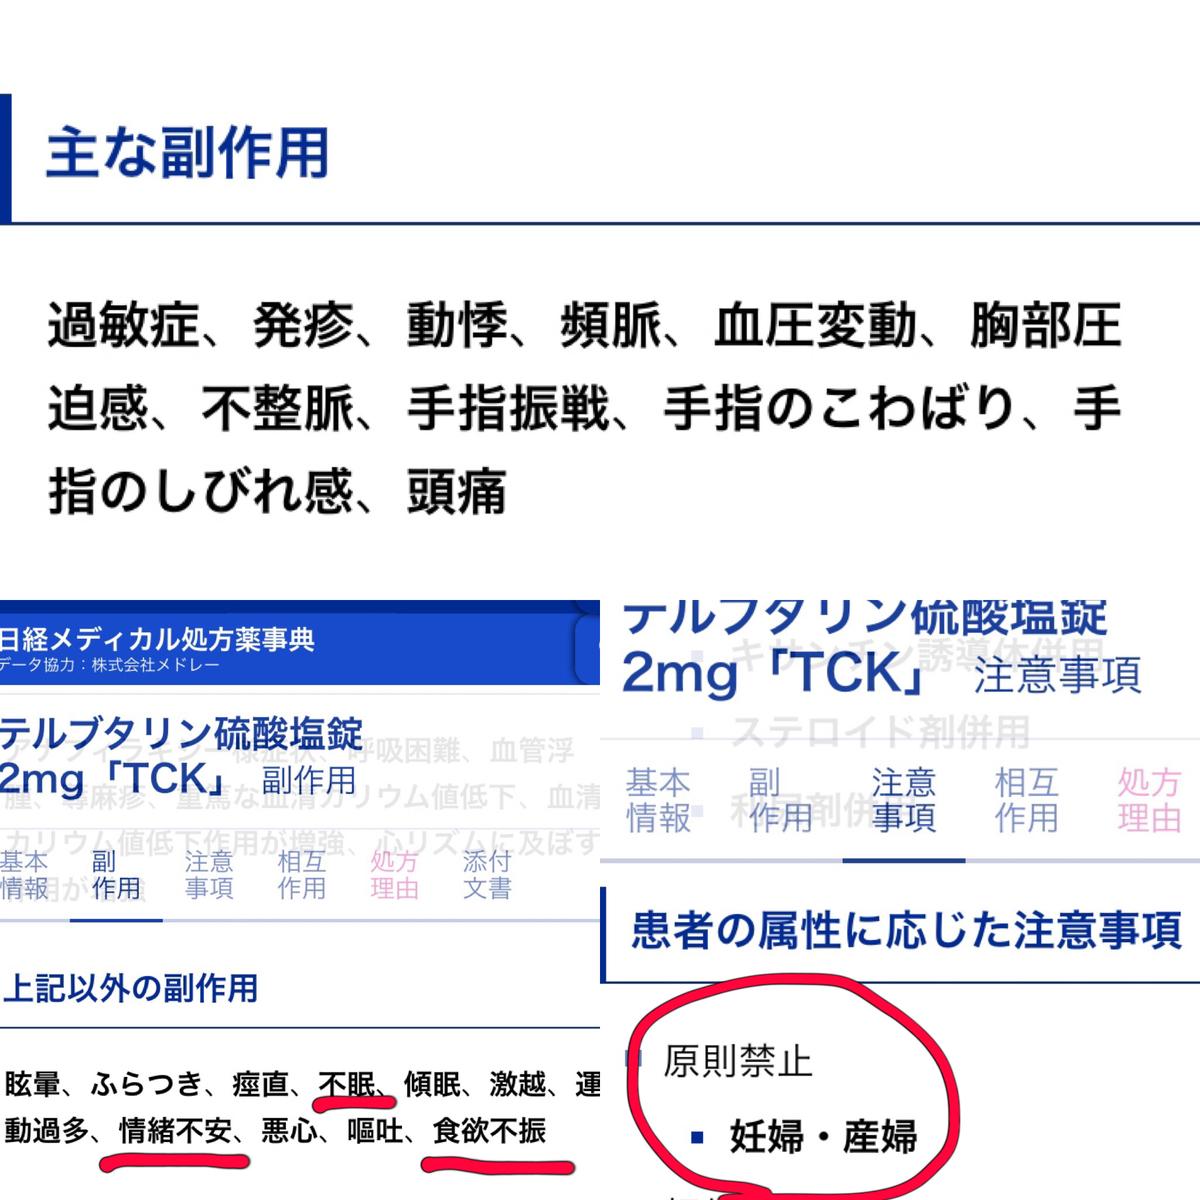 f:id:mainichi-kahchan:20190716202156j:plain